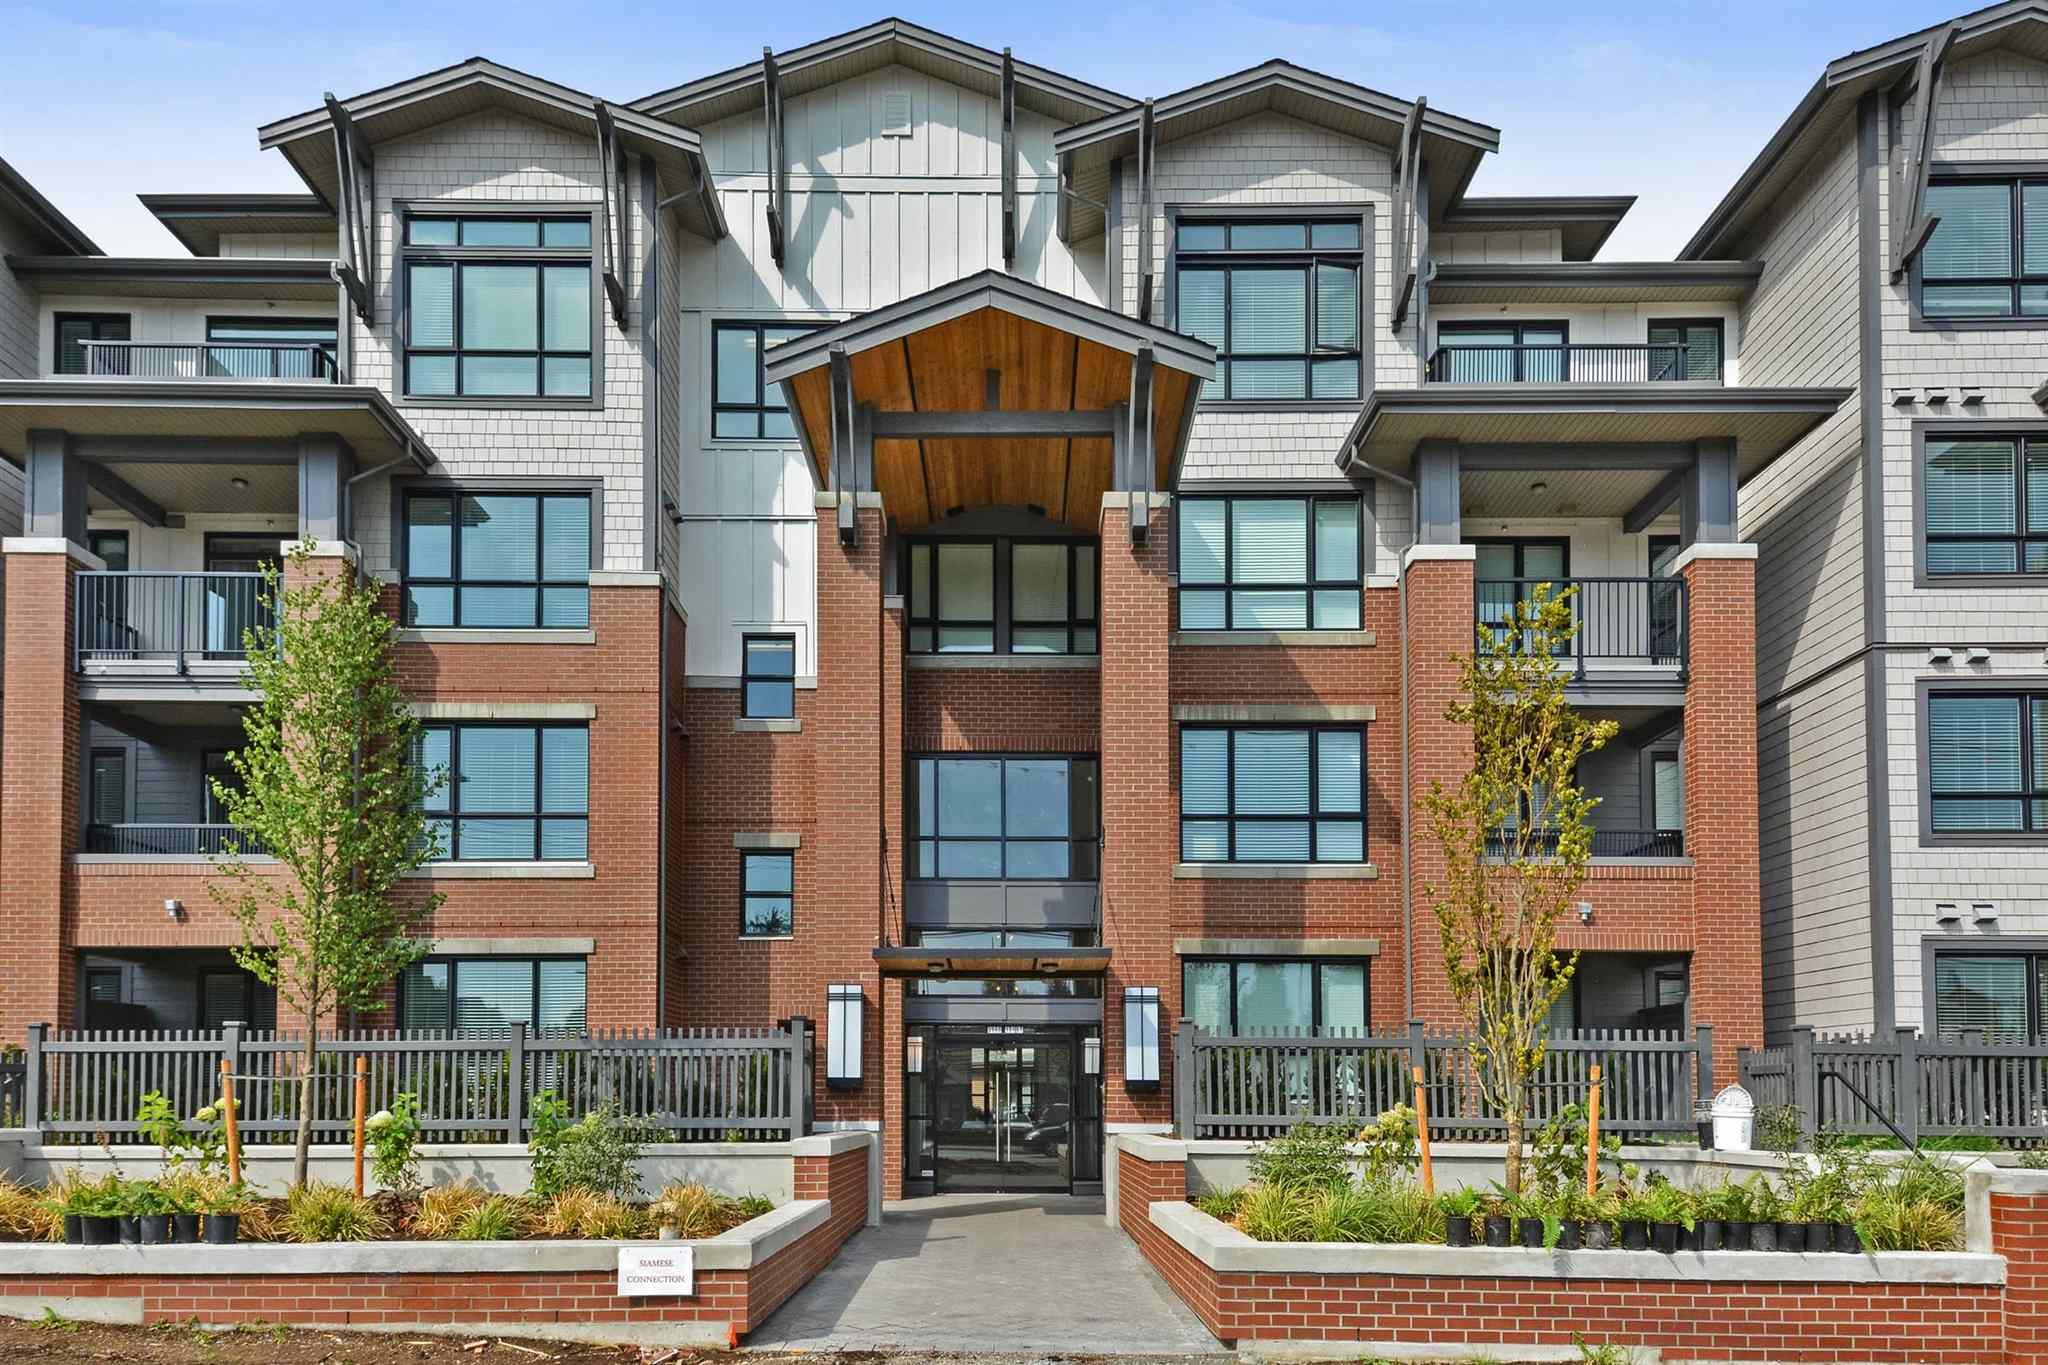 217 2960 151 STREET - King George Corridor Apartment/Condo for sale, 2 Bedrooms (R2605432) - #1